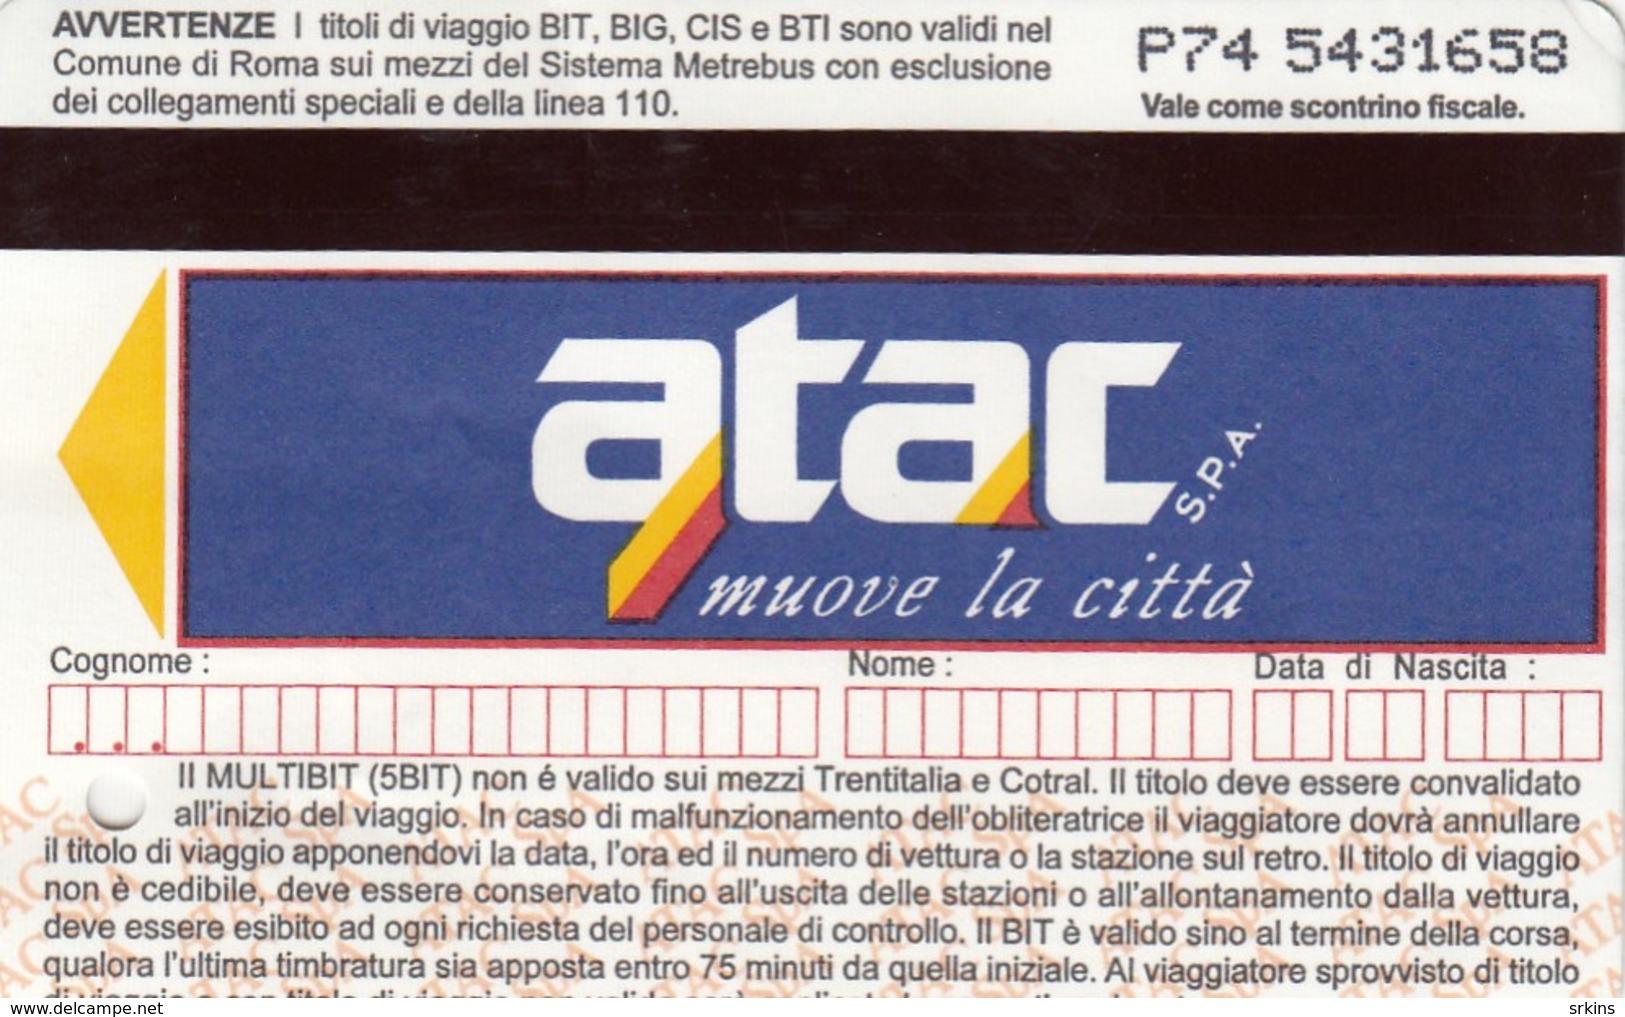 Bus Ticket 2005. Rome Italy Roma Italia - Busse